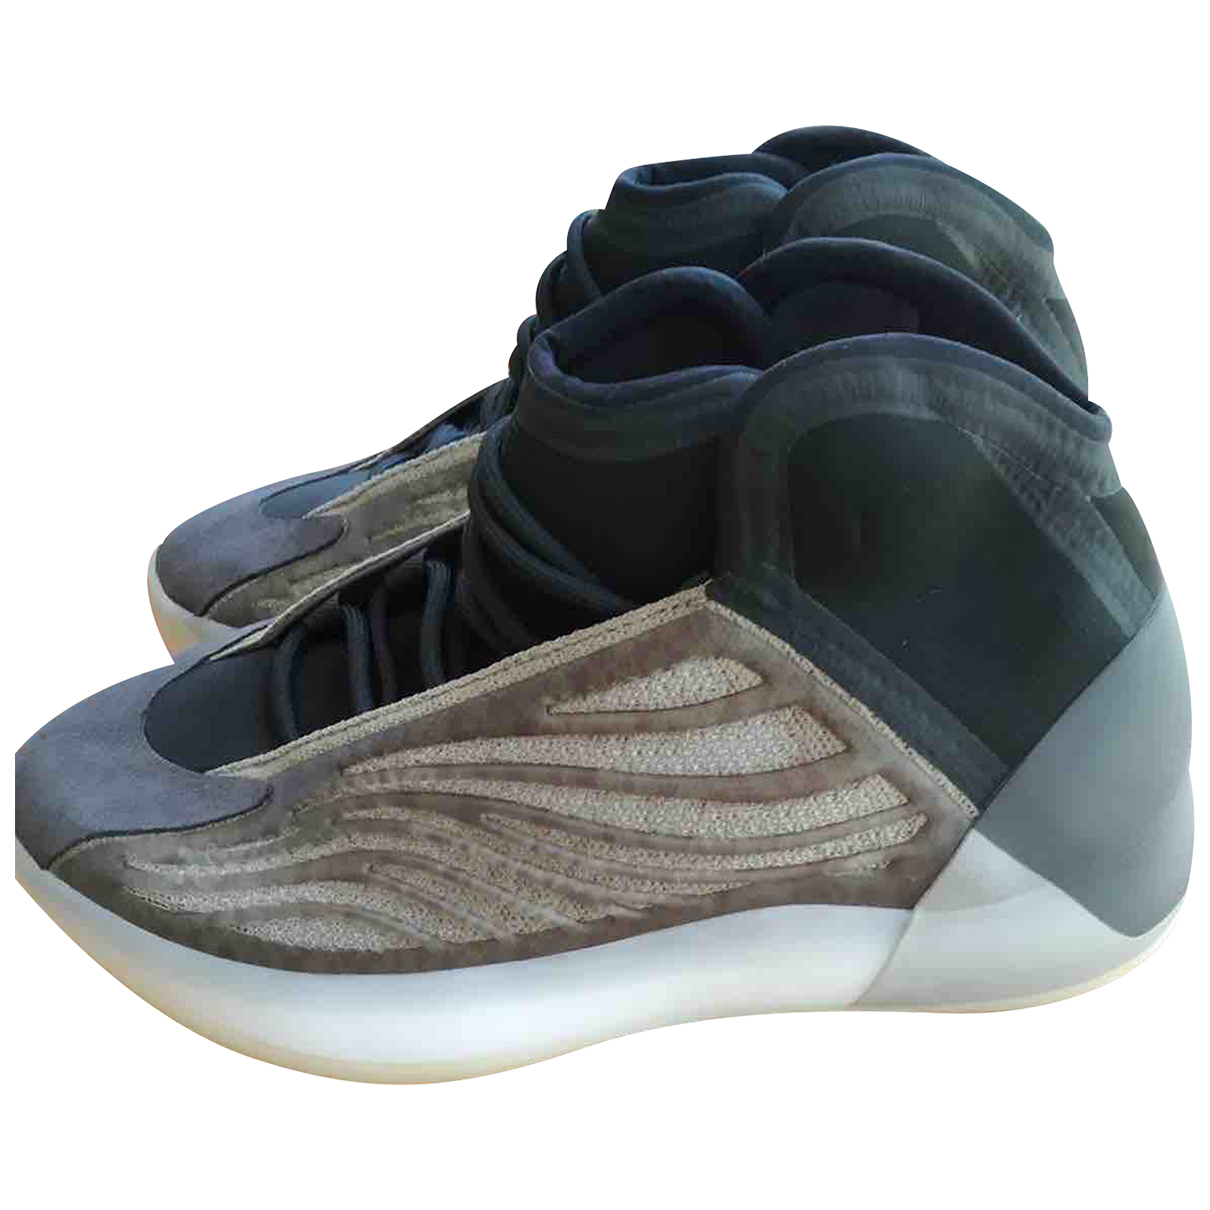 Yeezy X Adidas QNTM BSKTBL Grey Boots for Men 42.5 EU